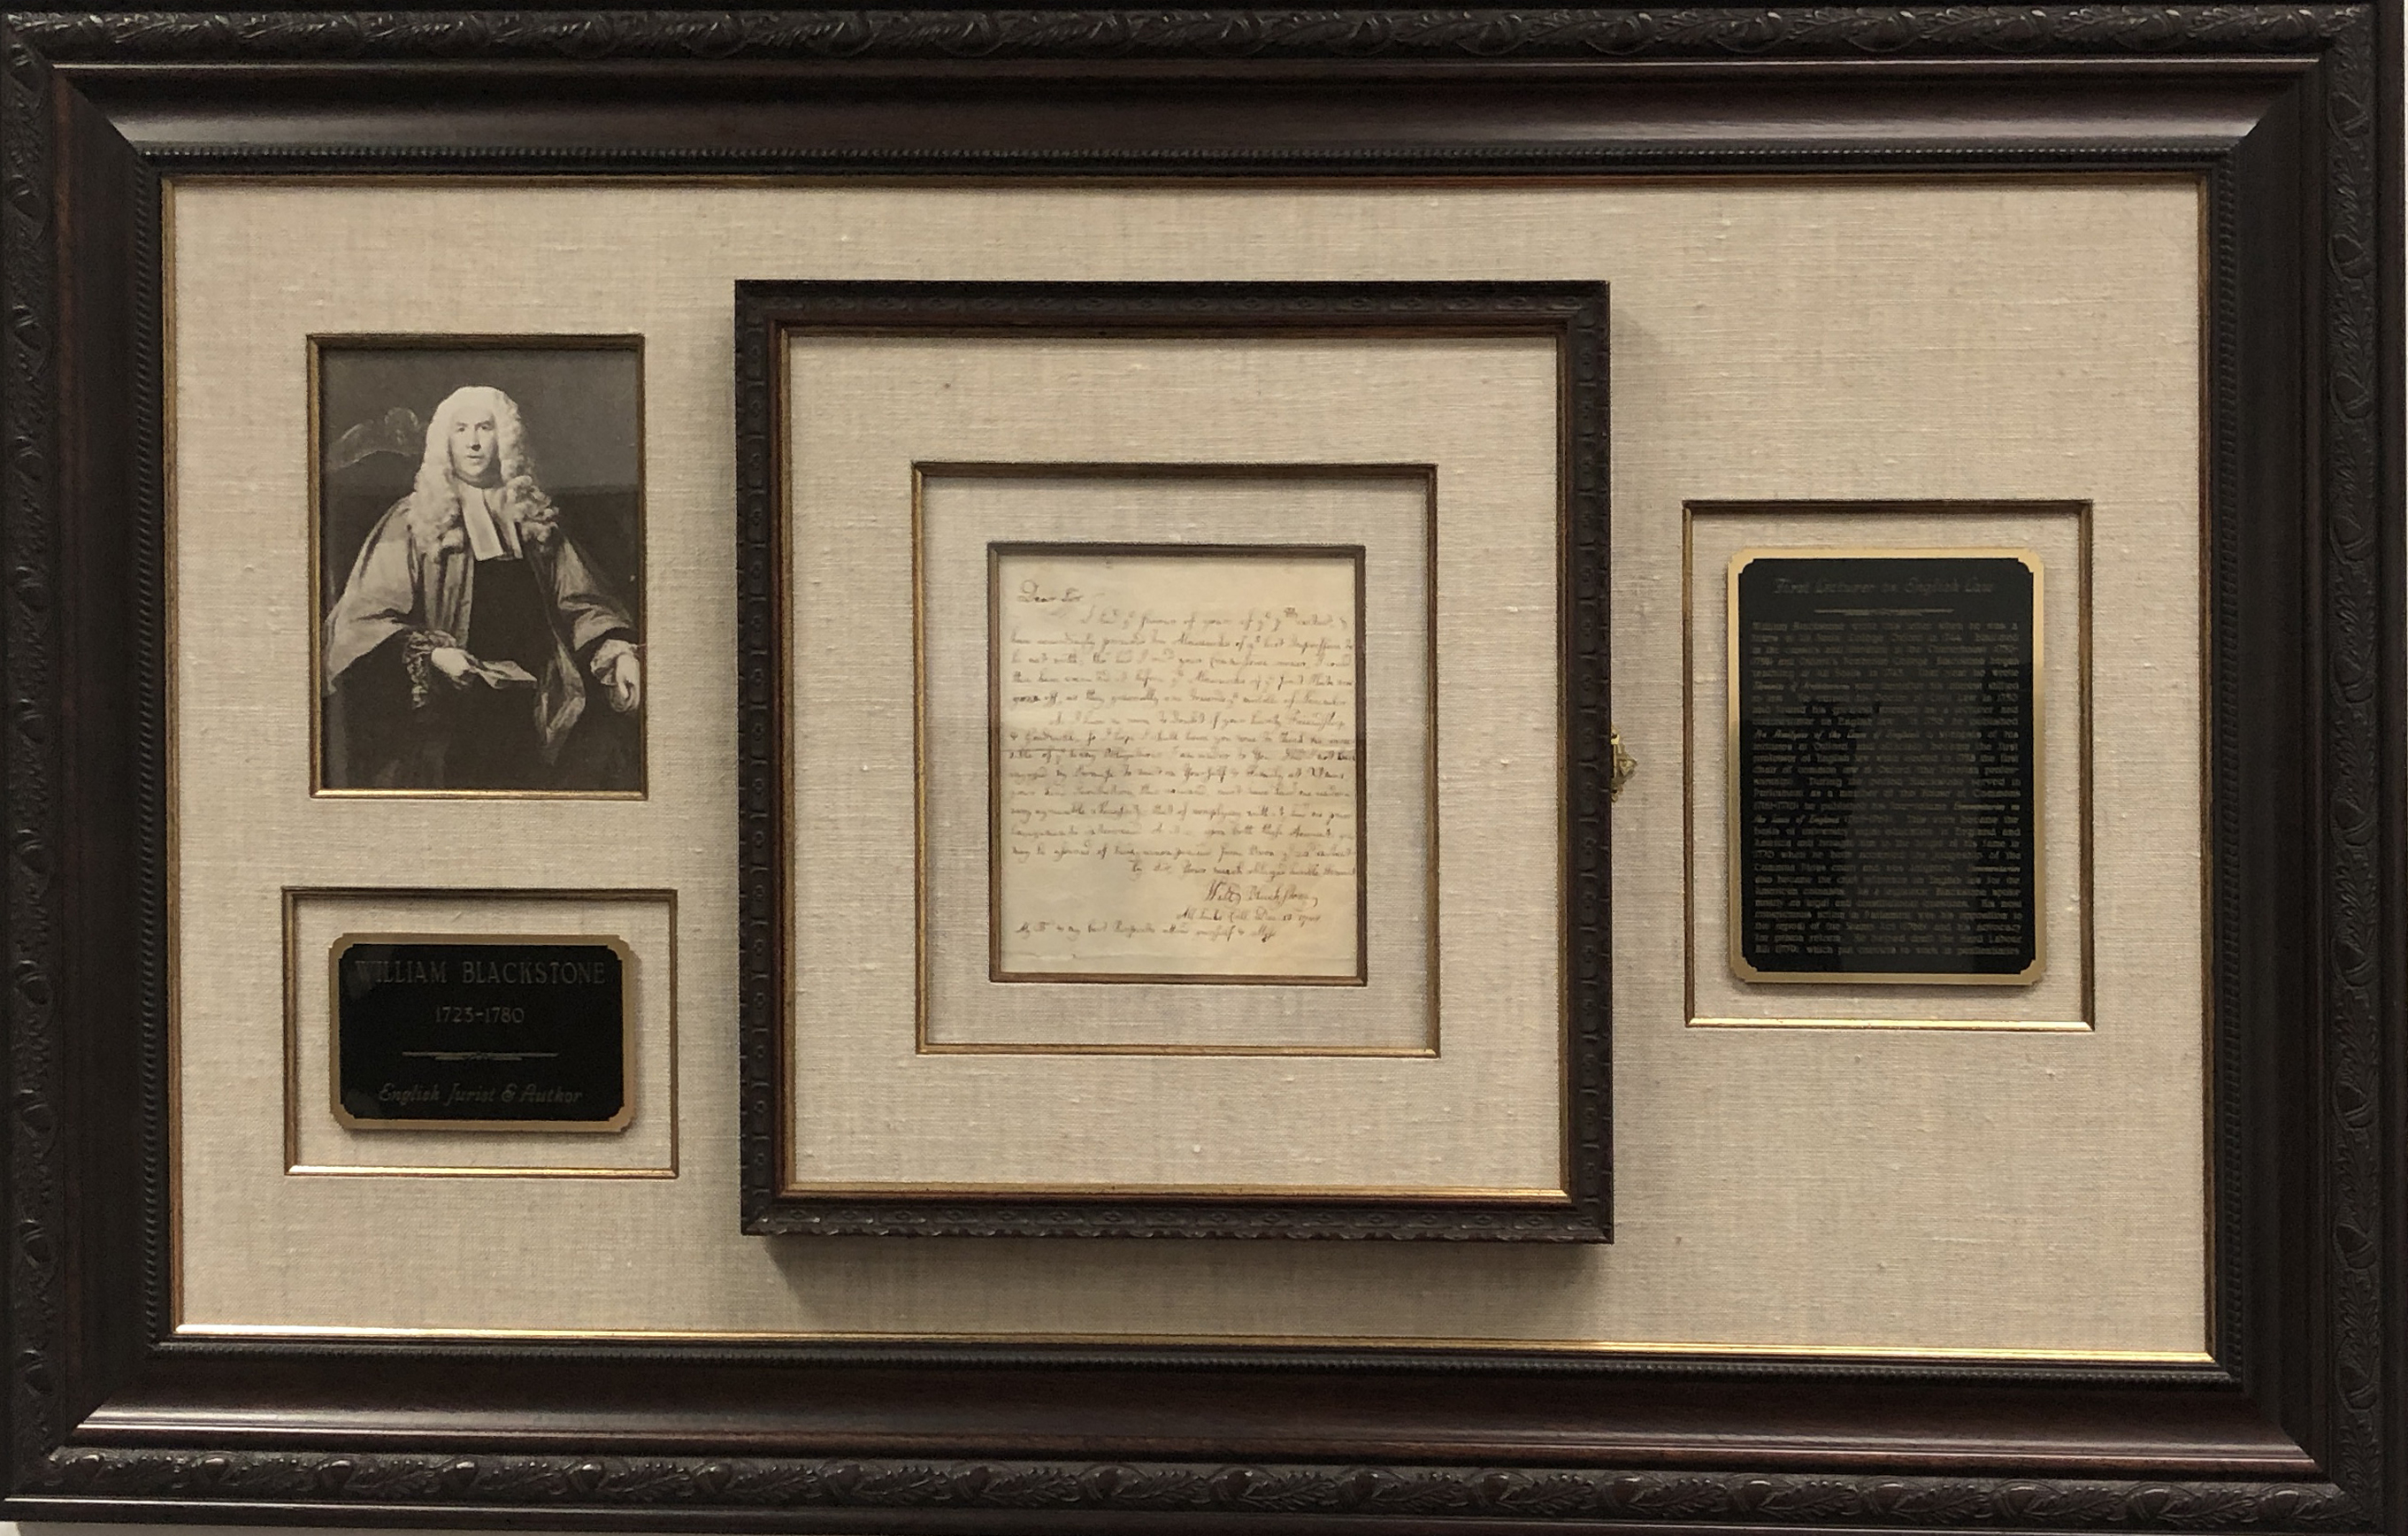 Framed letter of December 13, 1744 from William Blackstone